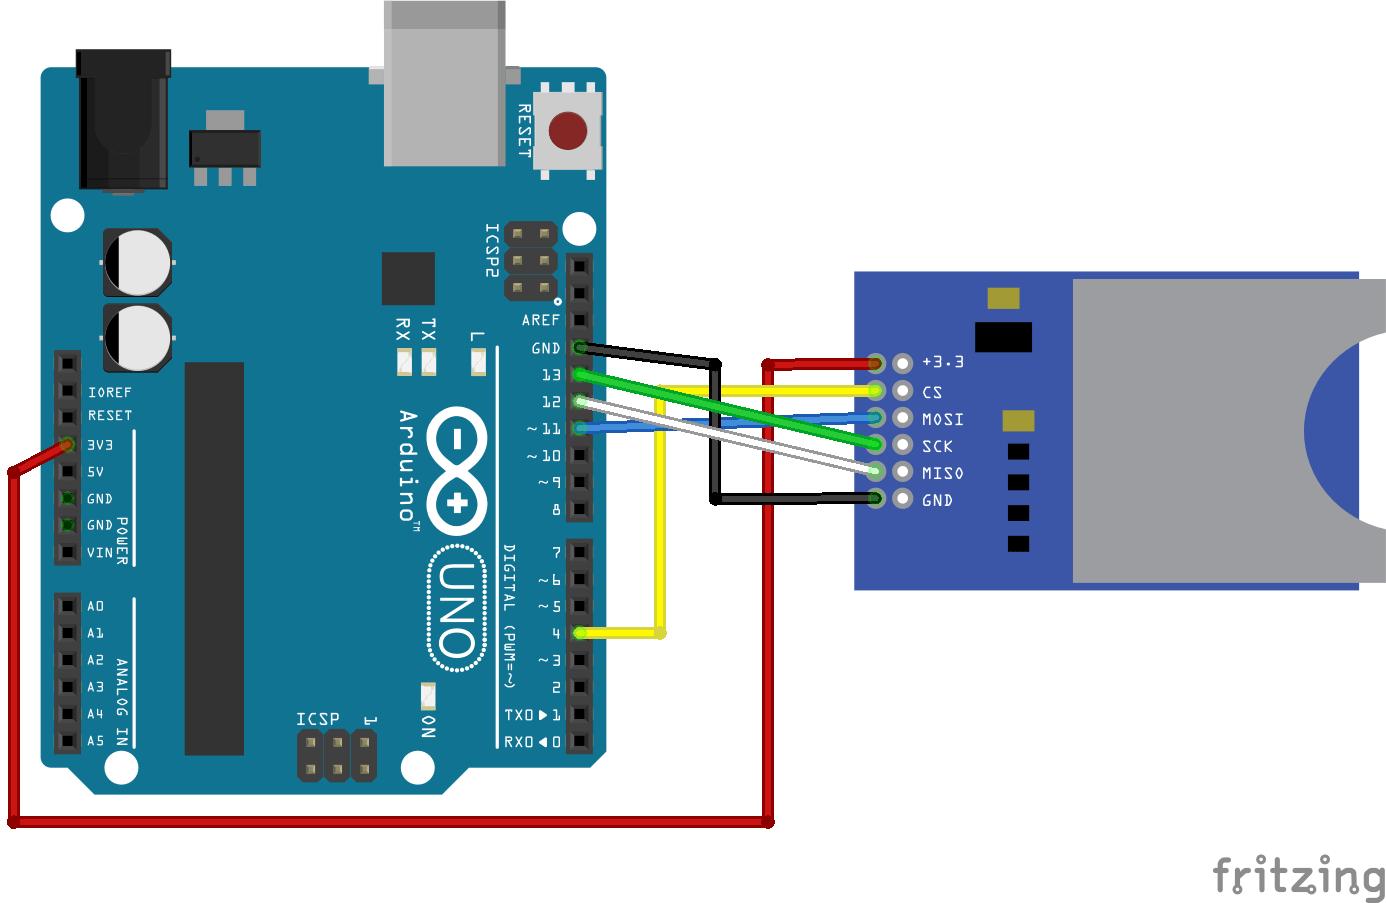 Guide to SD Card Module with Arduino | Random Nerd Tutorials on 3 wire start stop push, 3 wire start stop diagram, 3 wire thermostat diagram, push button schematic, 3 wire pump controller diagram,